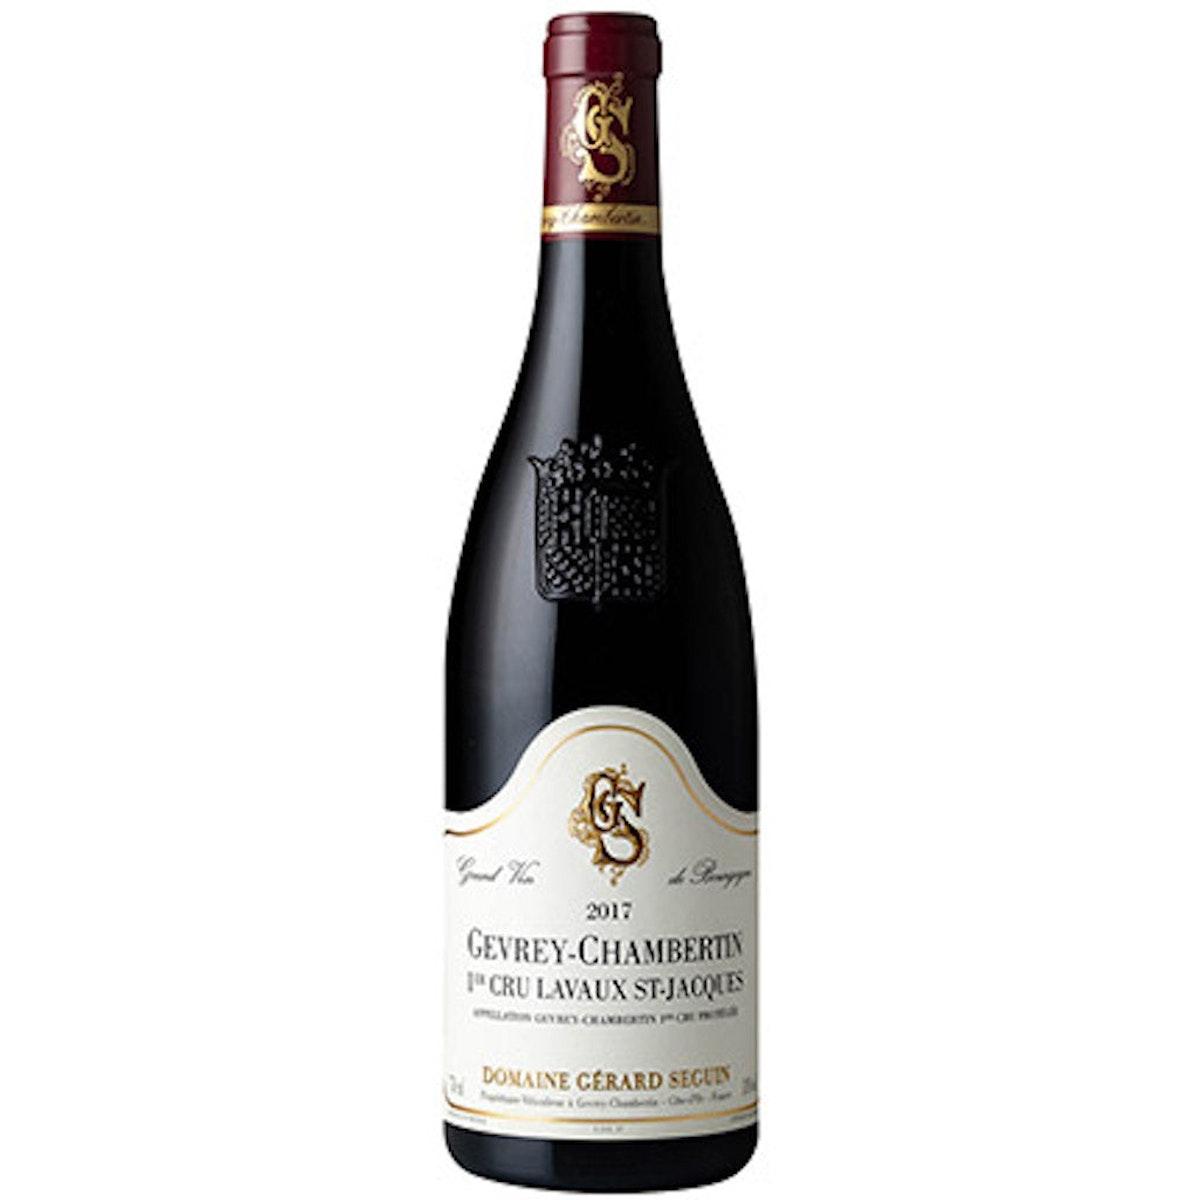 Gevrey-Chambertin 'Lavaux-St-Jacques 1er Cru', 2017